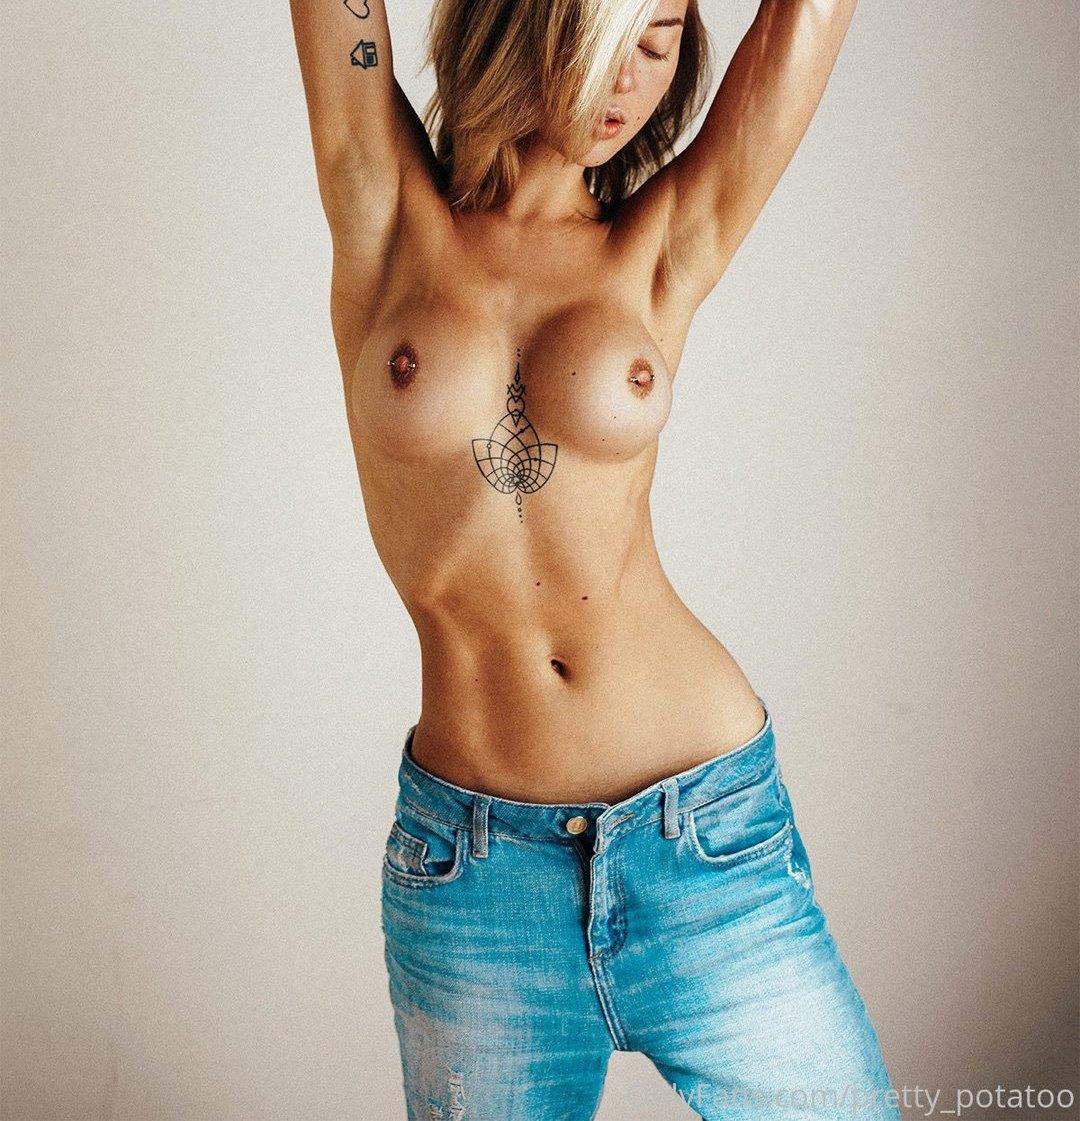 Janna Pavlova Pretty Potatoo Onlyfans Nudes Leaks 0019